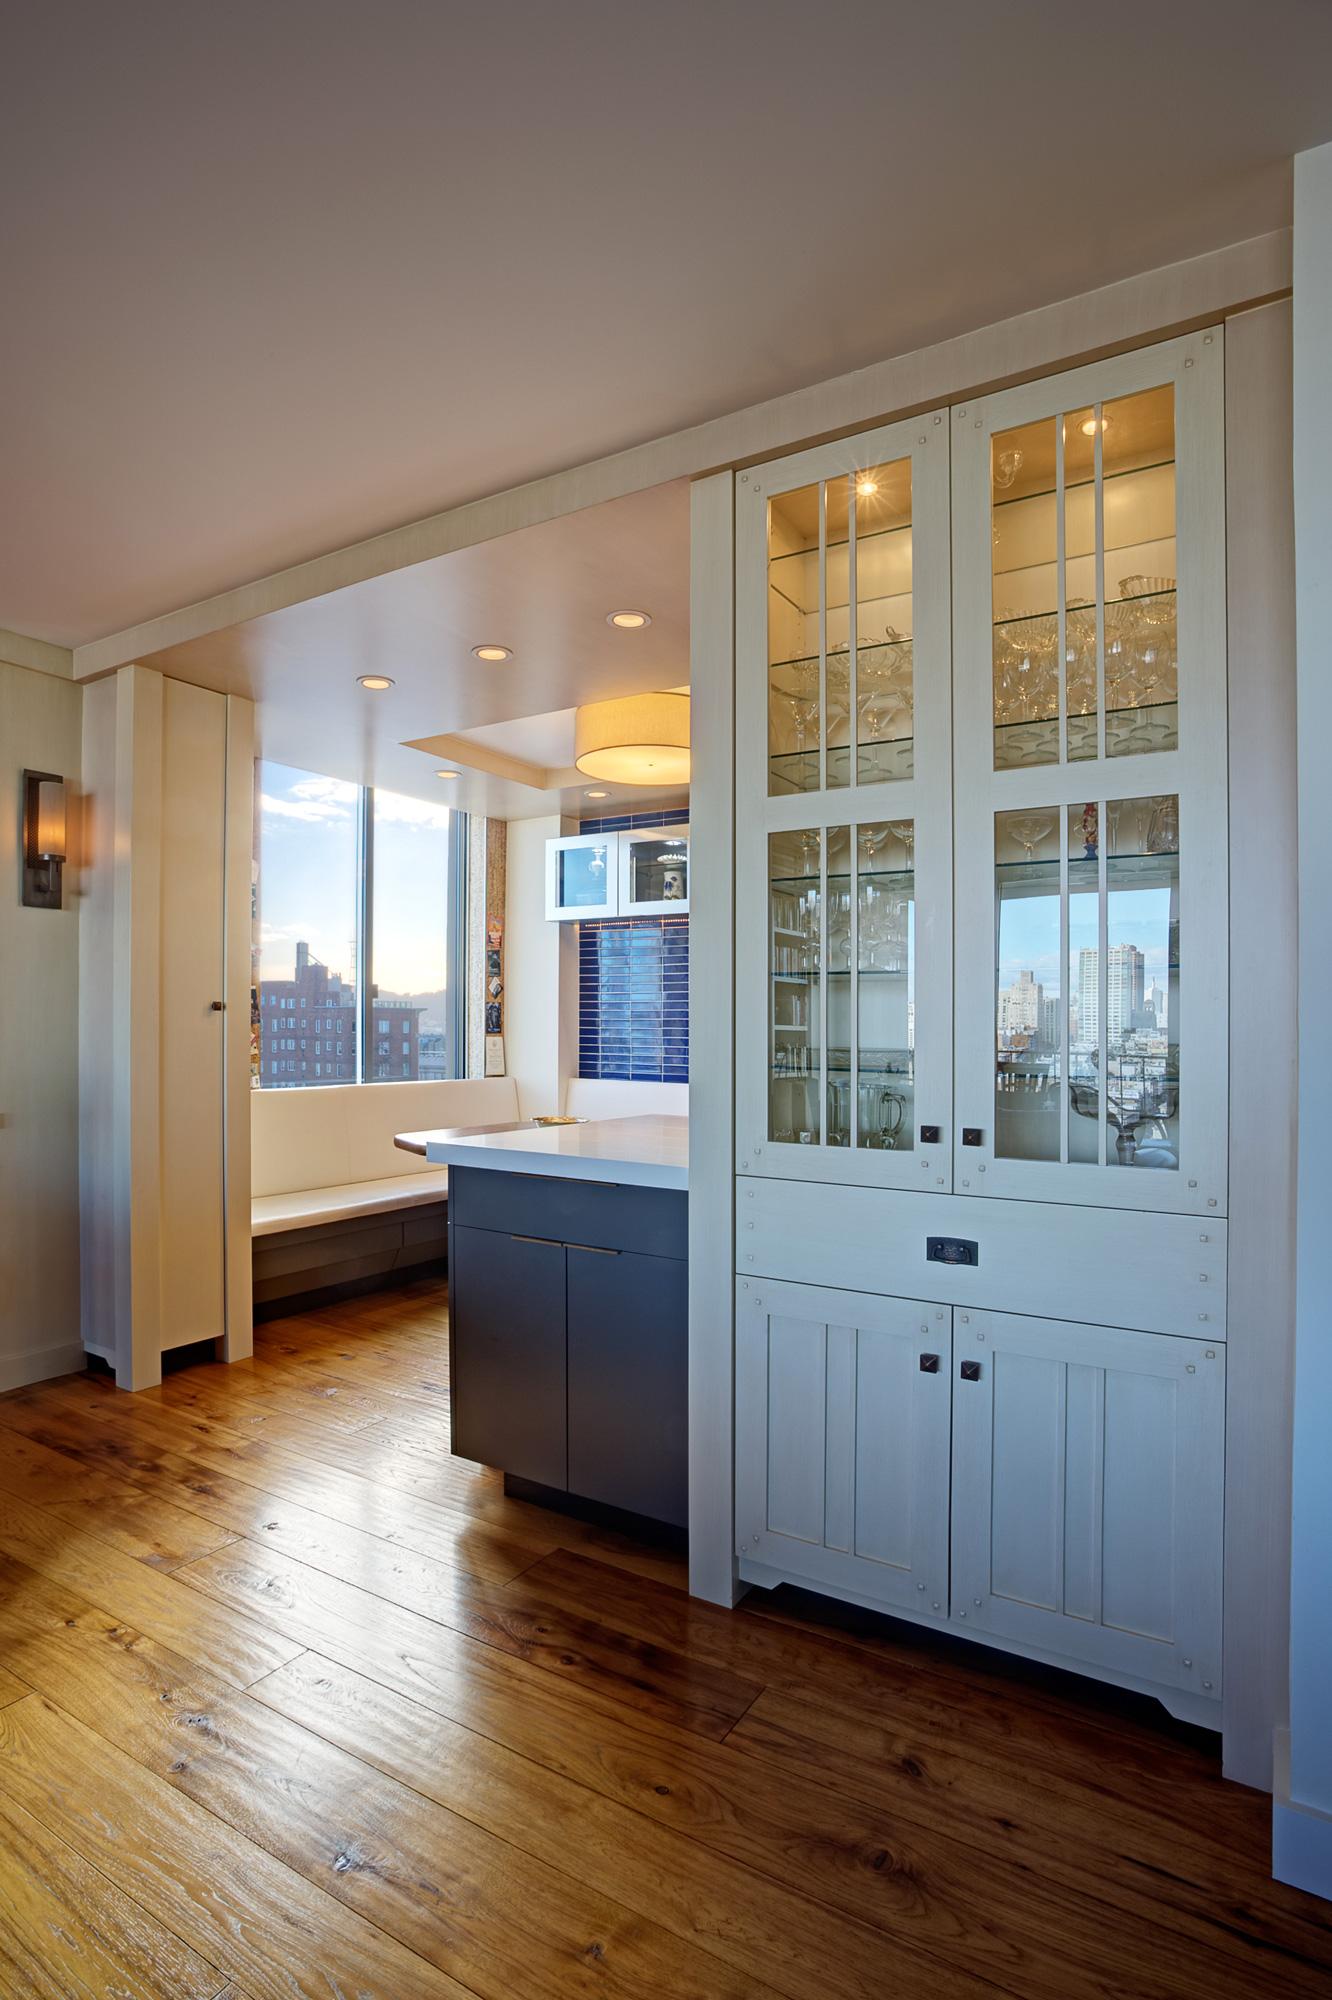 Kaplan-Architects-high-rise-interior-remdoeled-kitchen.jpg